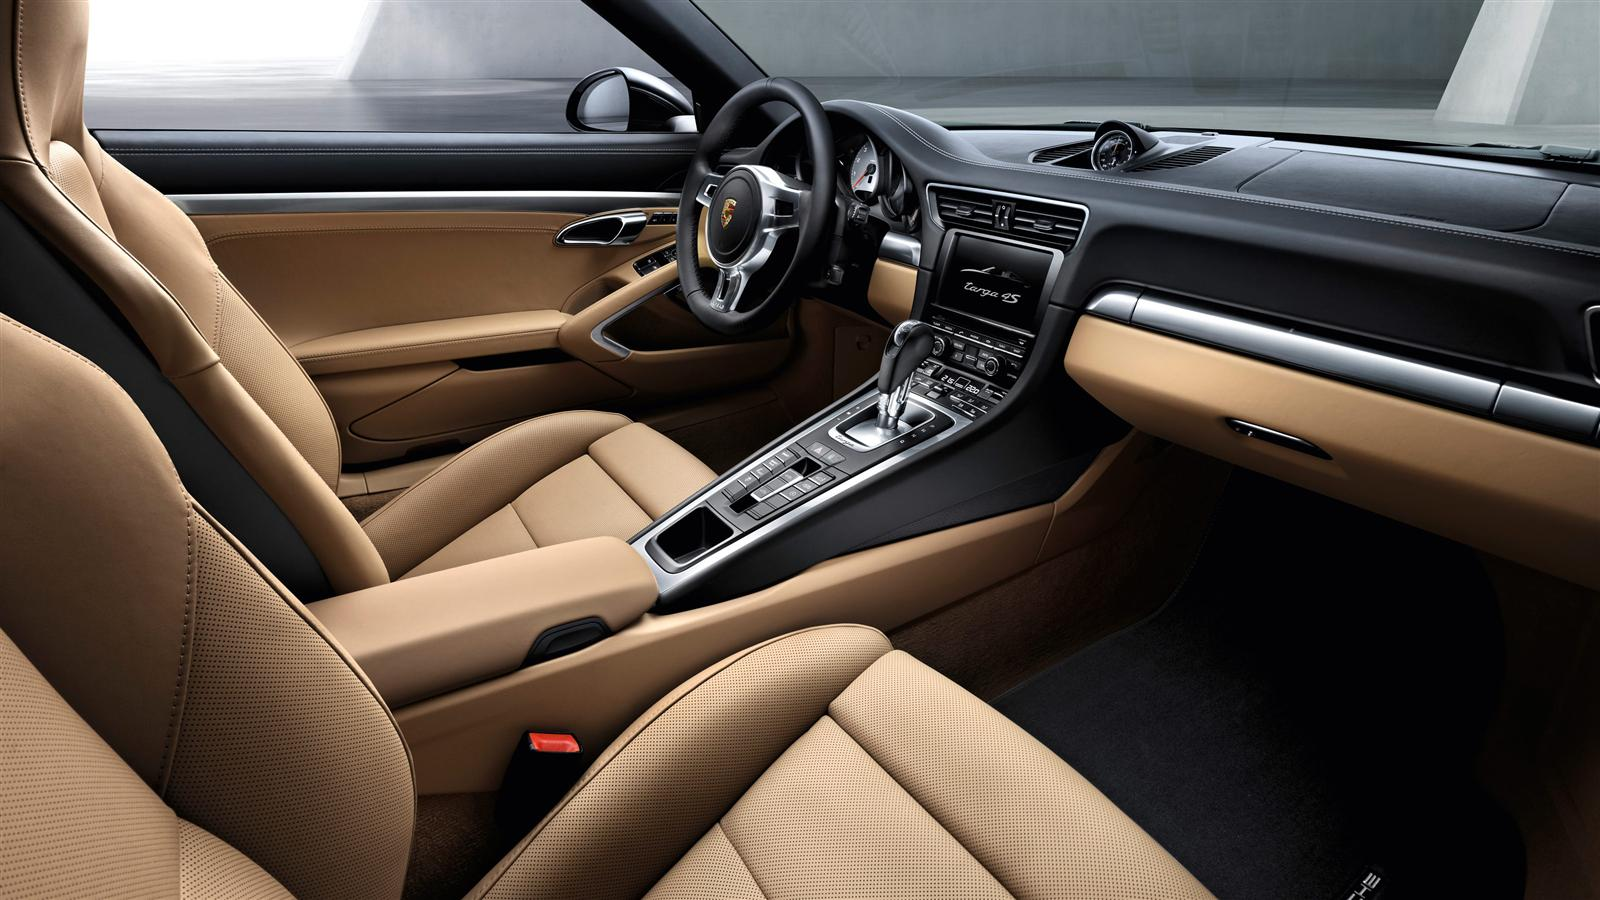 Black Porsche 911 Targa 4s Interior Forcegt Com